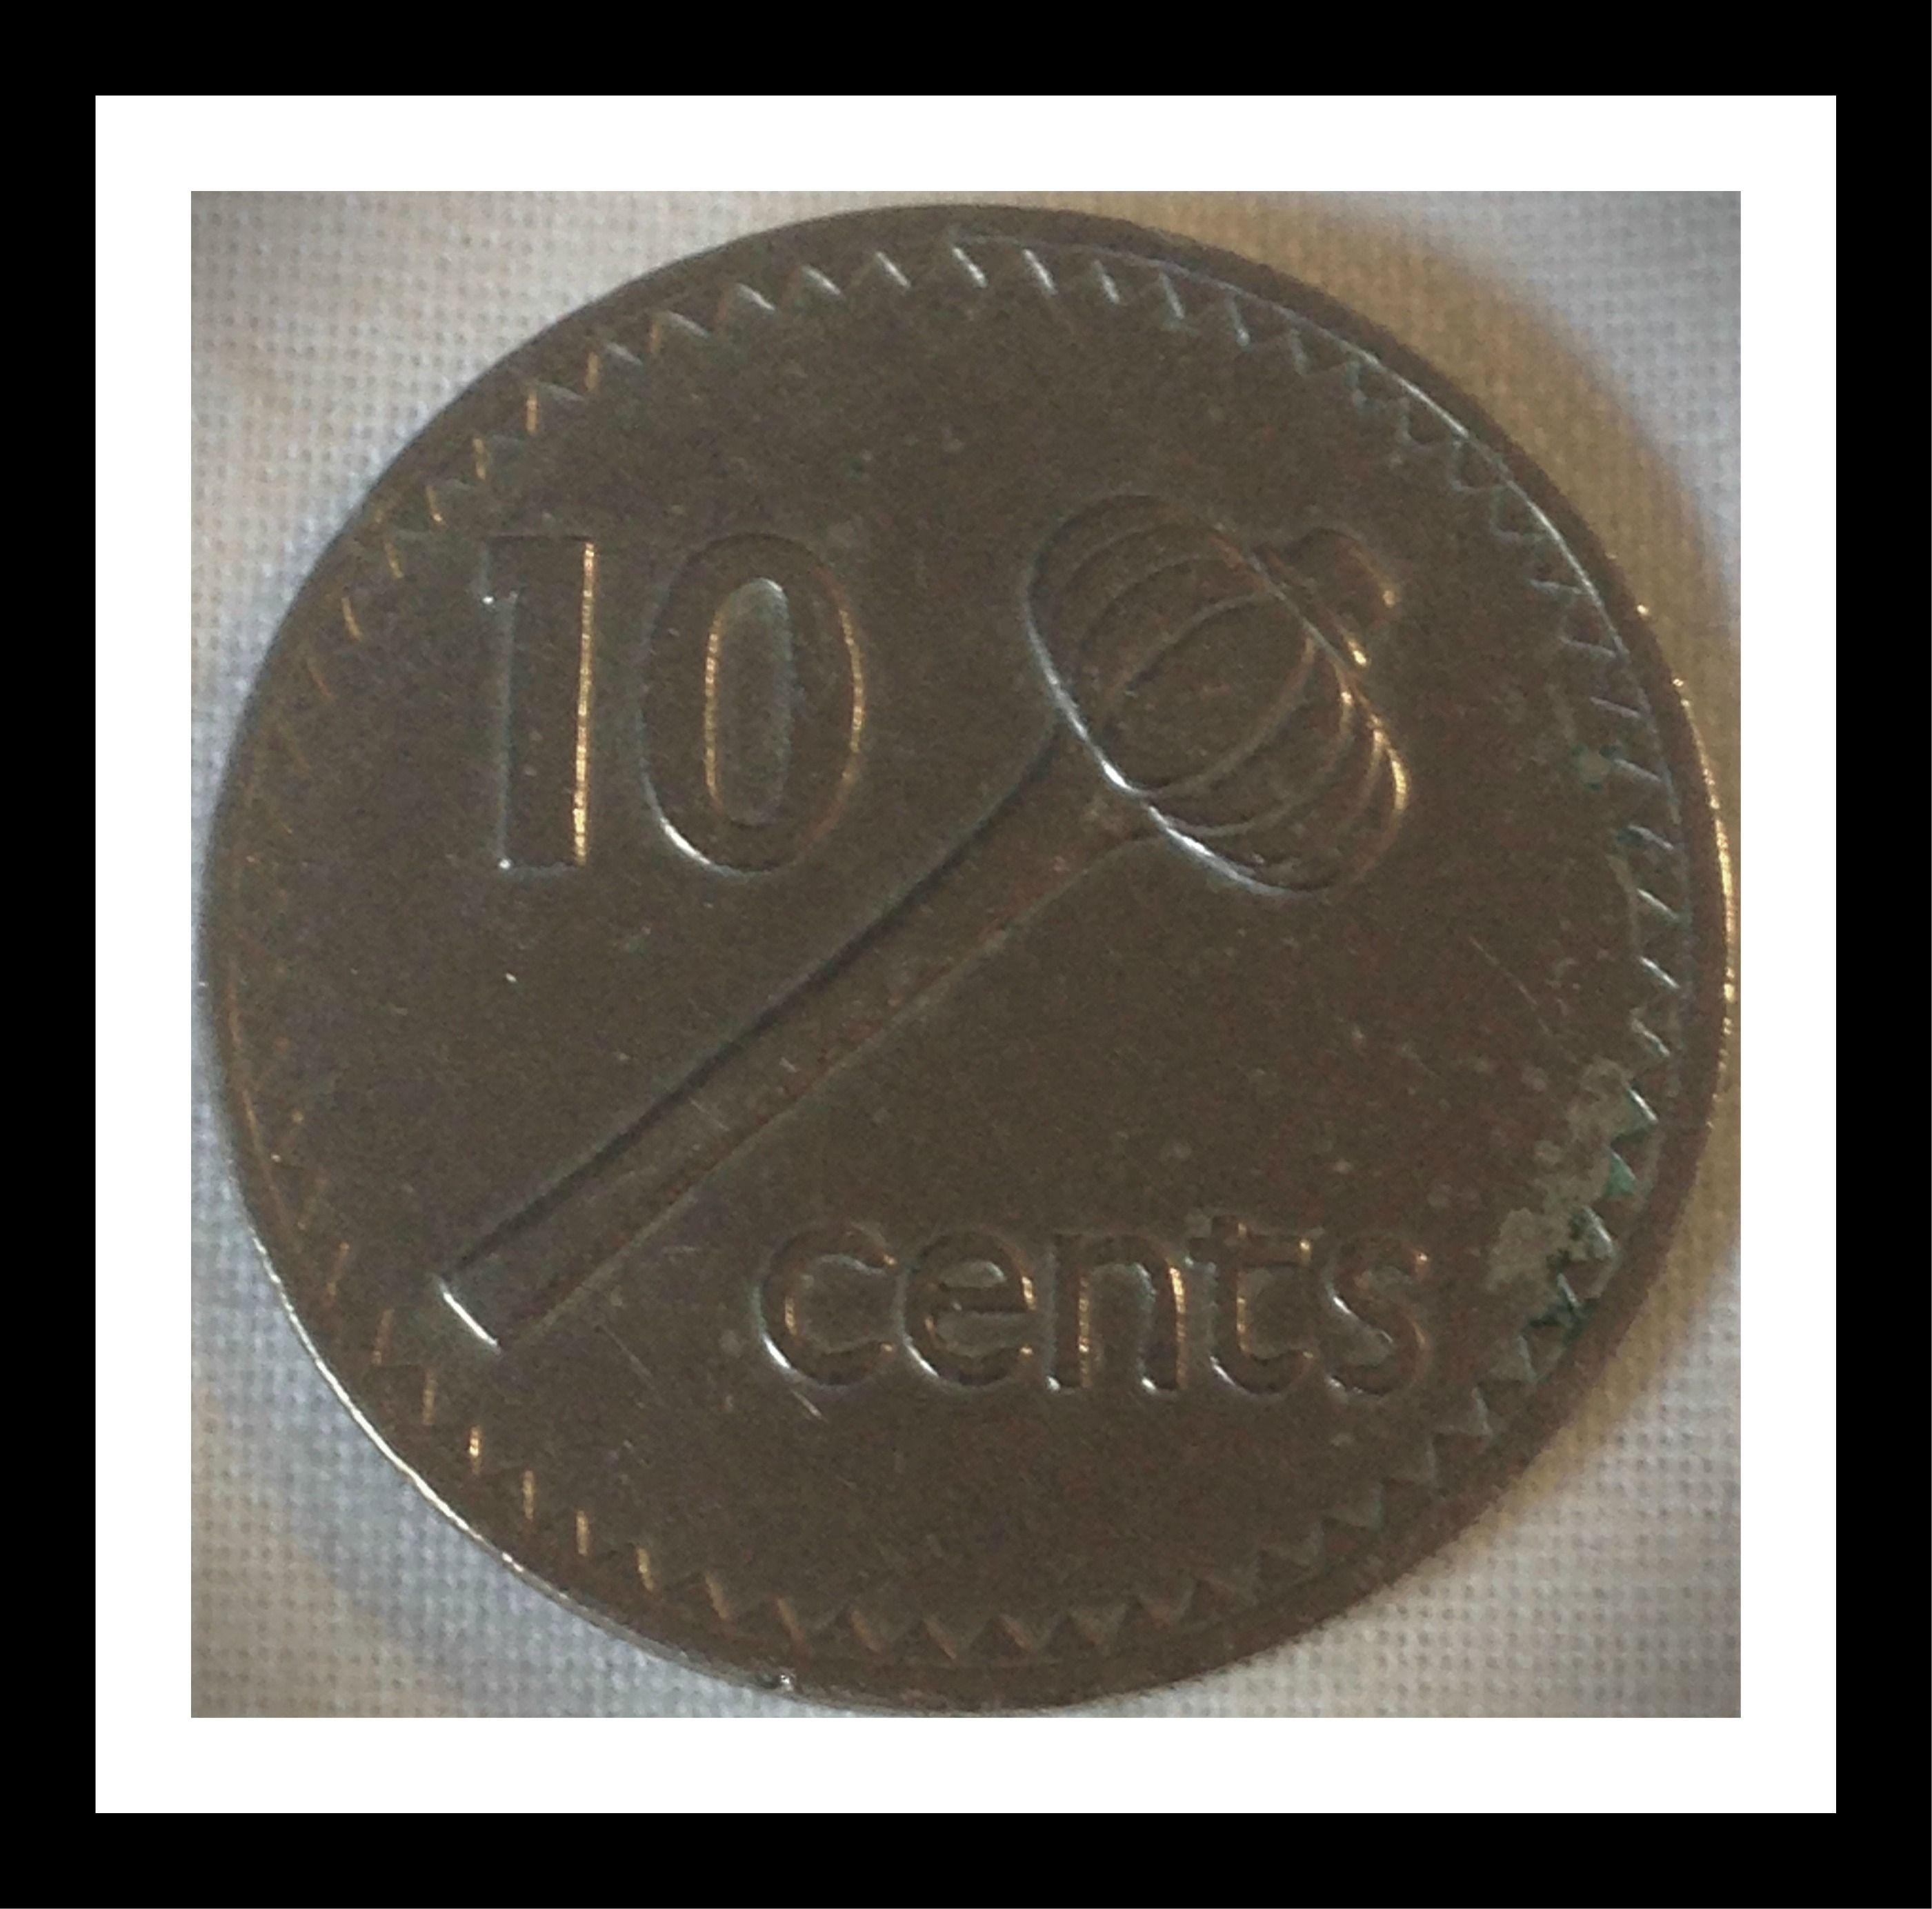 1970 20 CENTS PLATYPUS PROOF AUSTRALIA